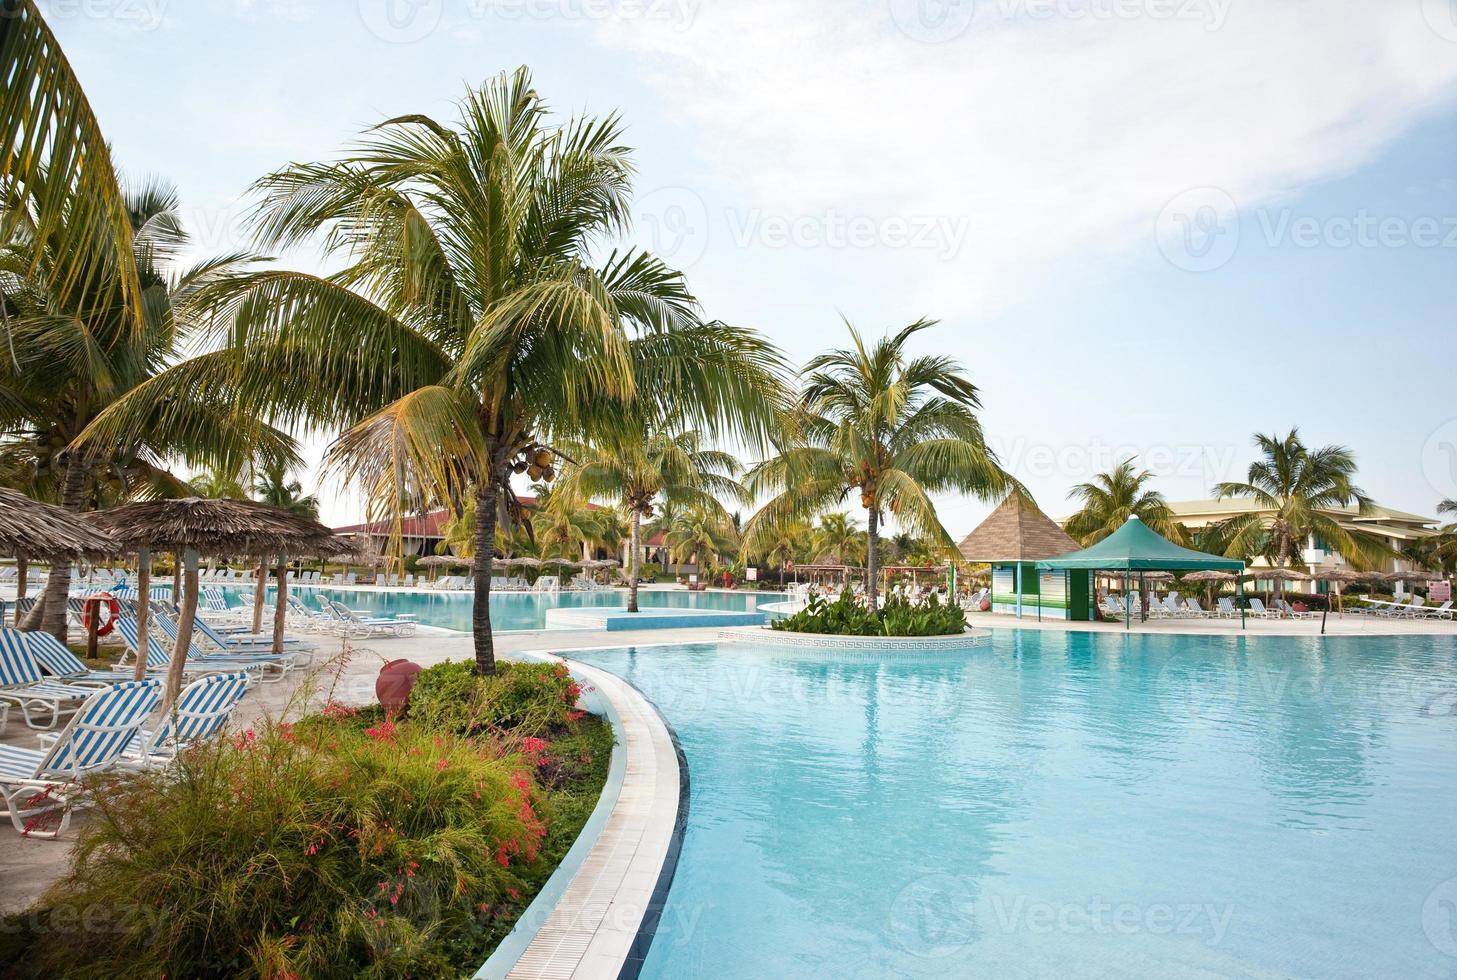 Karibik Resort foto